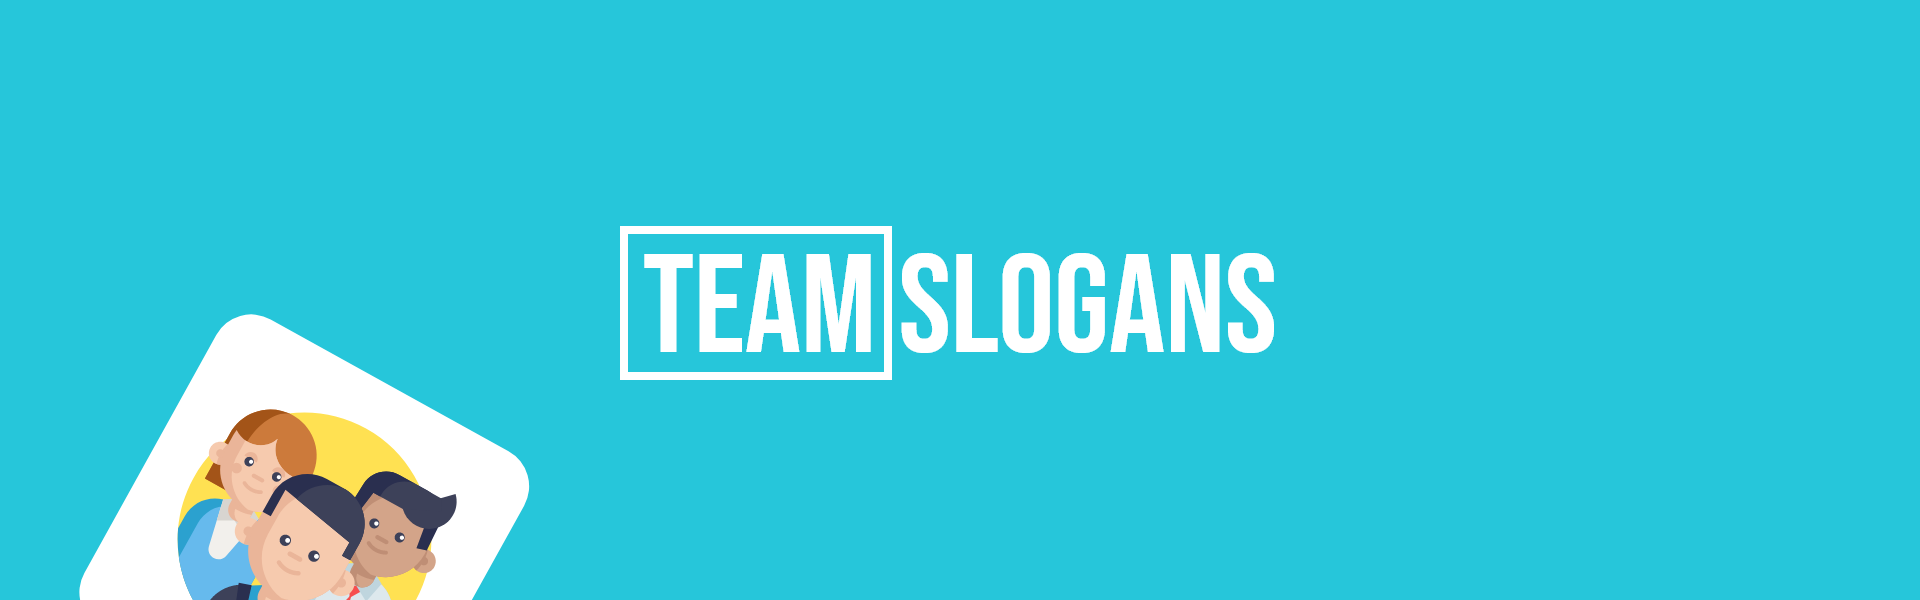 team slogans taglines